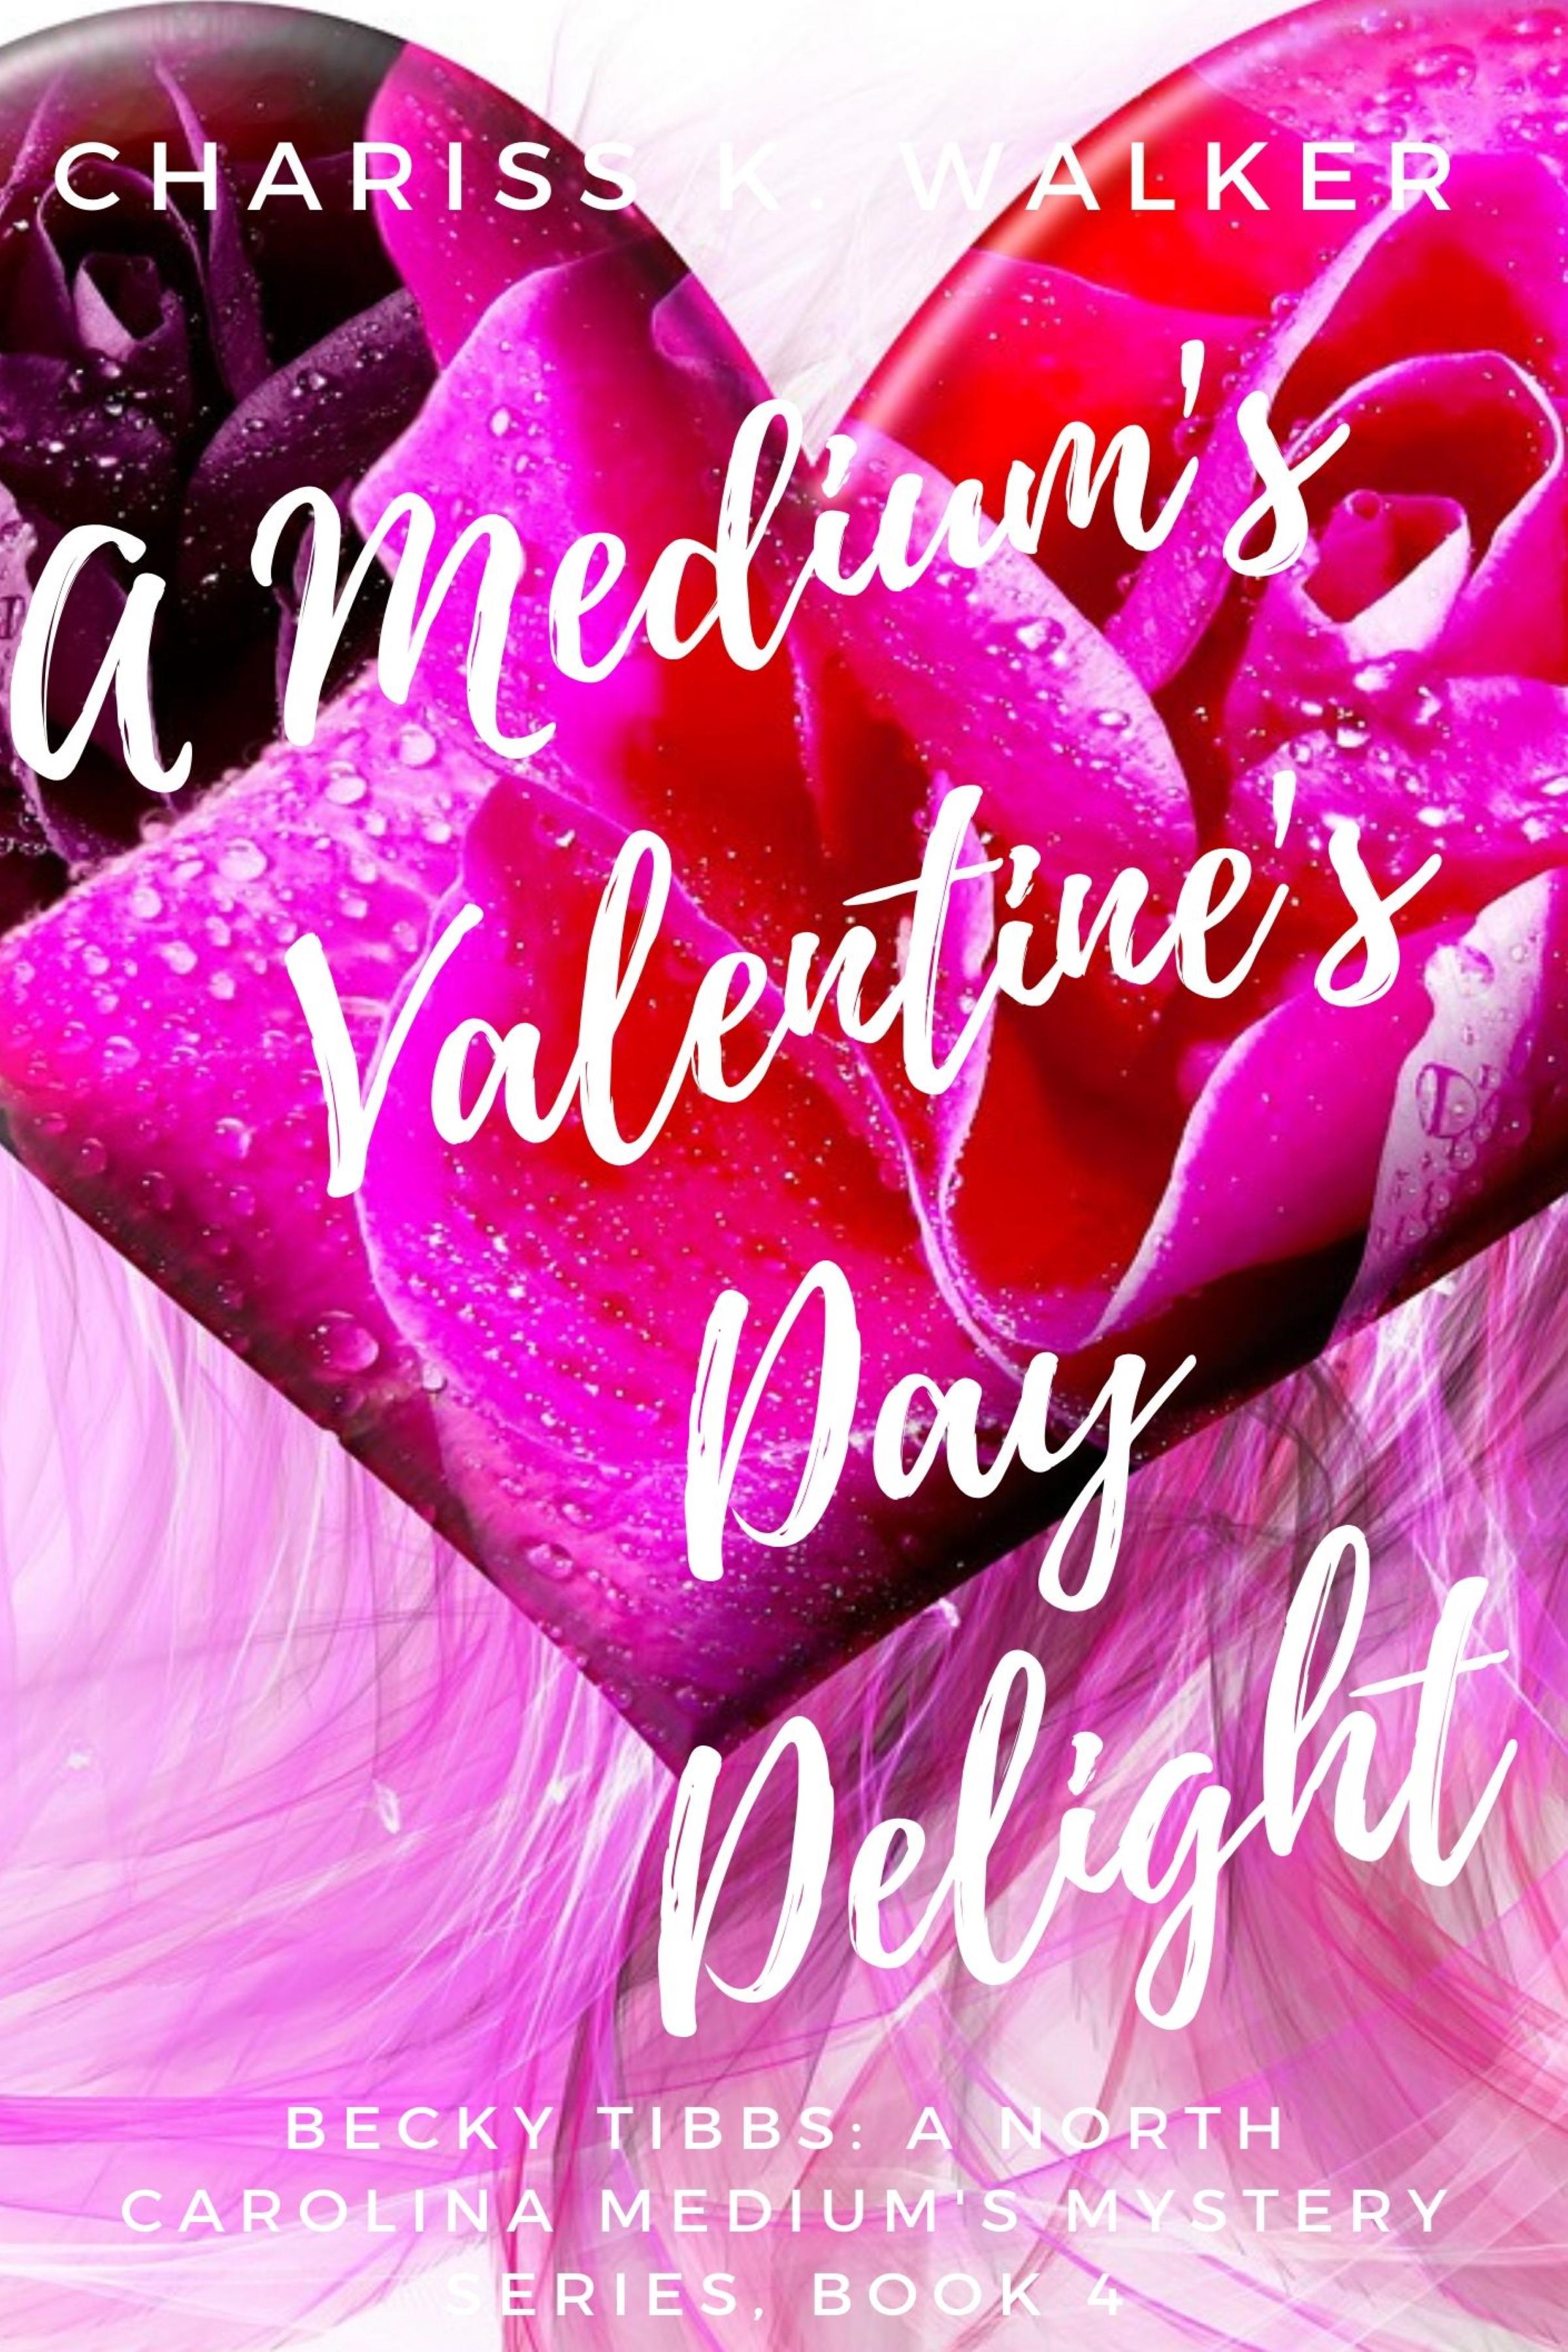 [PDF] [EPUB] A Medium's Valentine's Day Delight (Becky Tibbs: A North Carolina Medium #4) Download by Chariss K. Walker